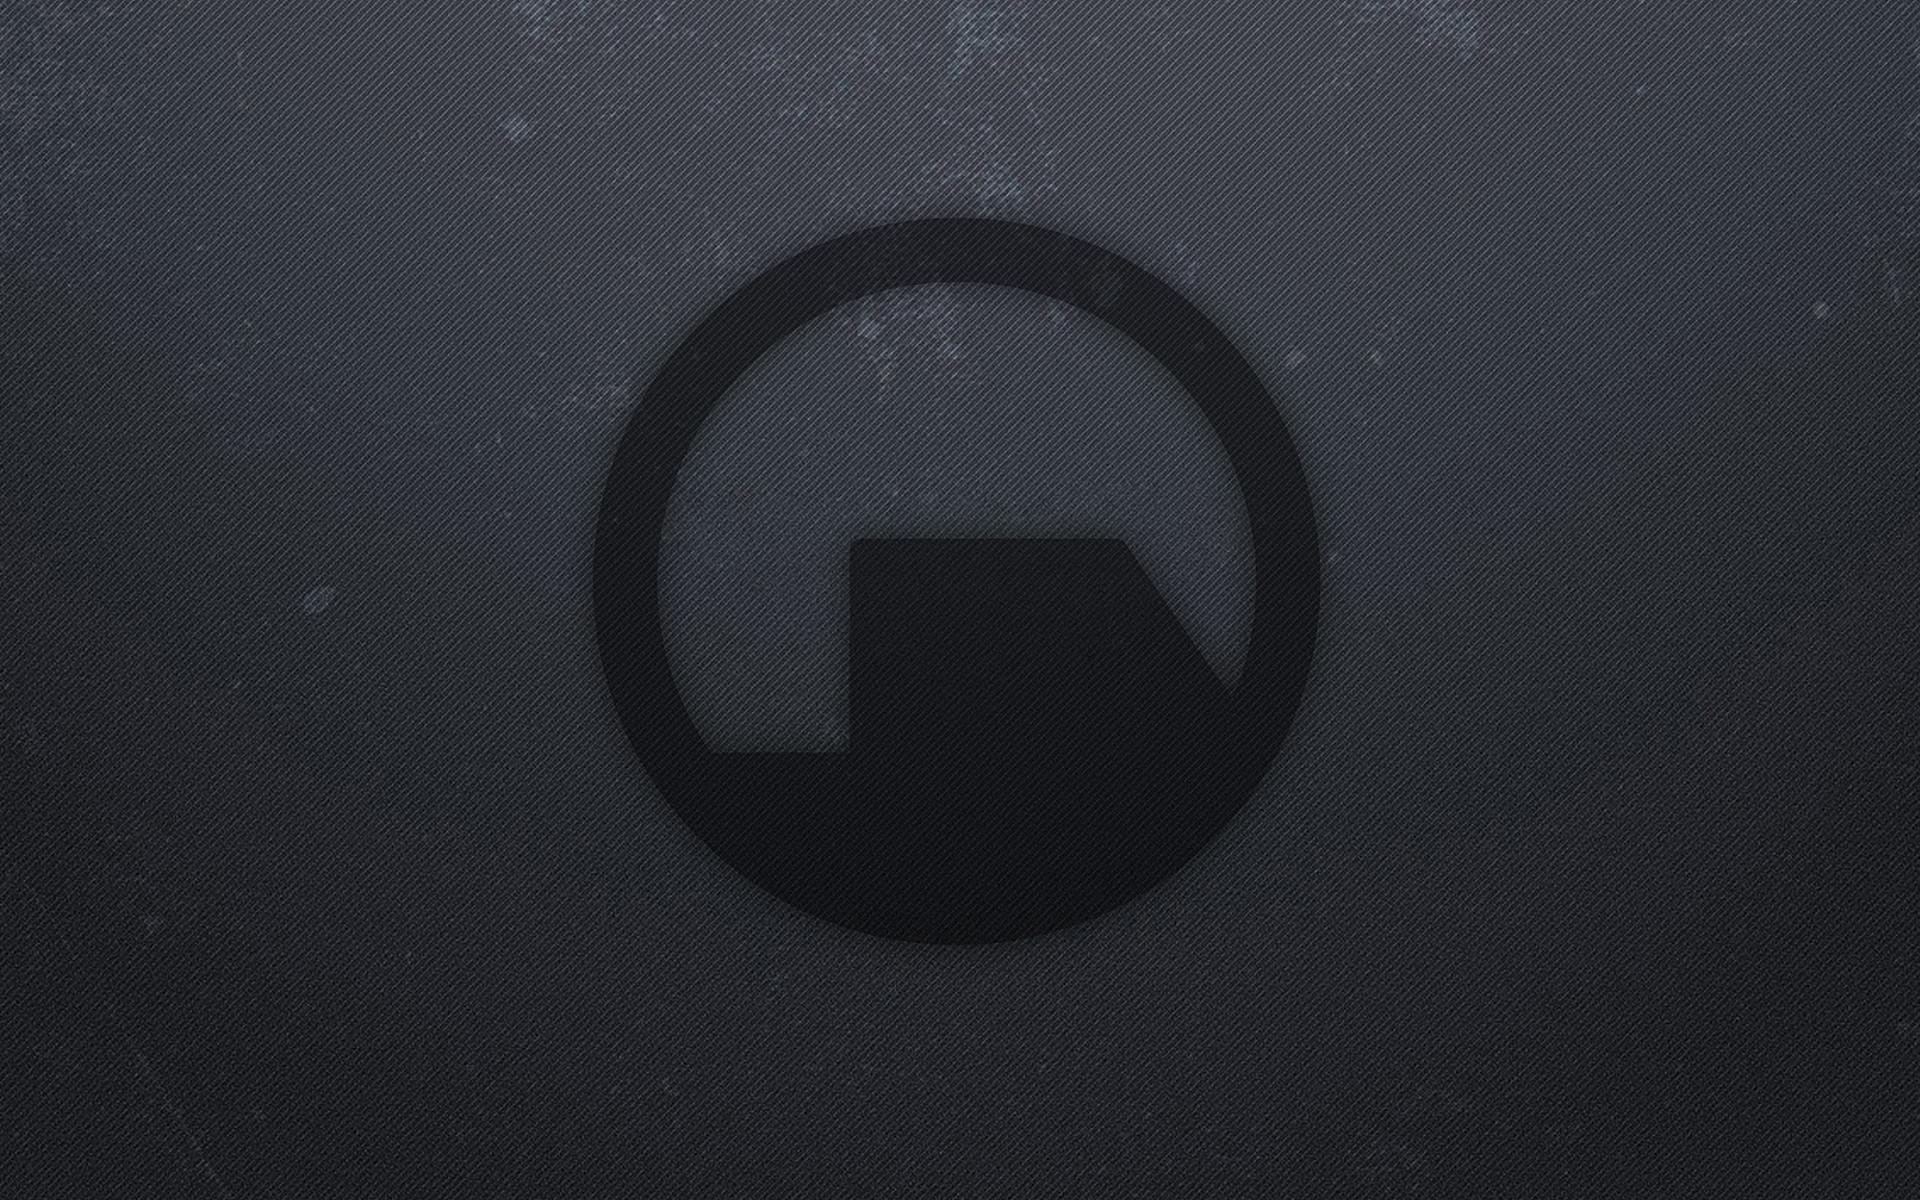 black-mesa-logo.jpg, …